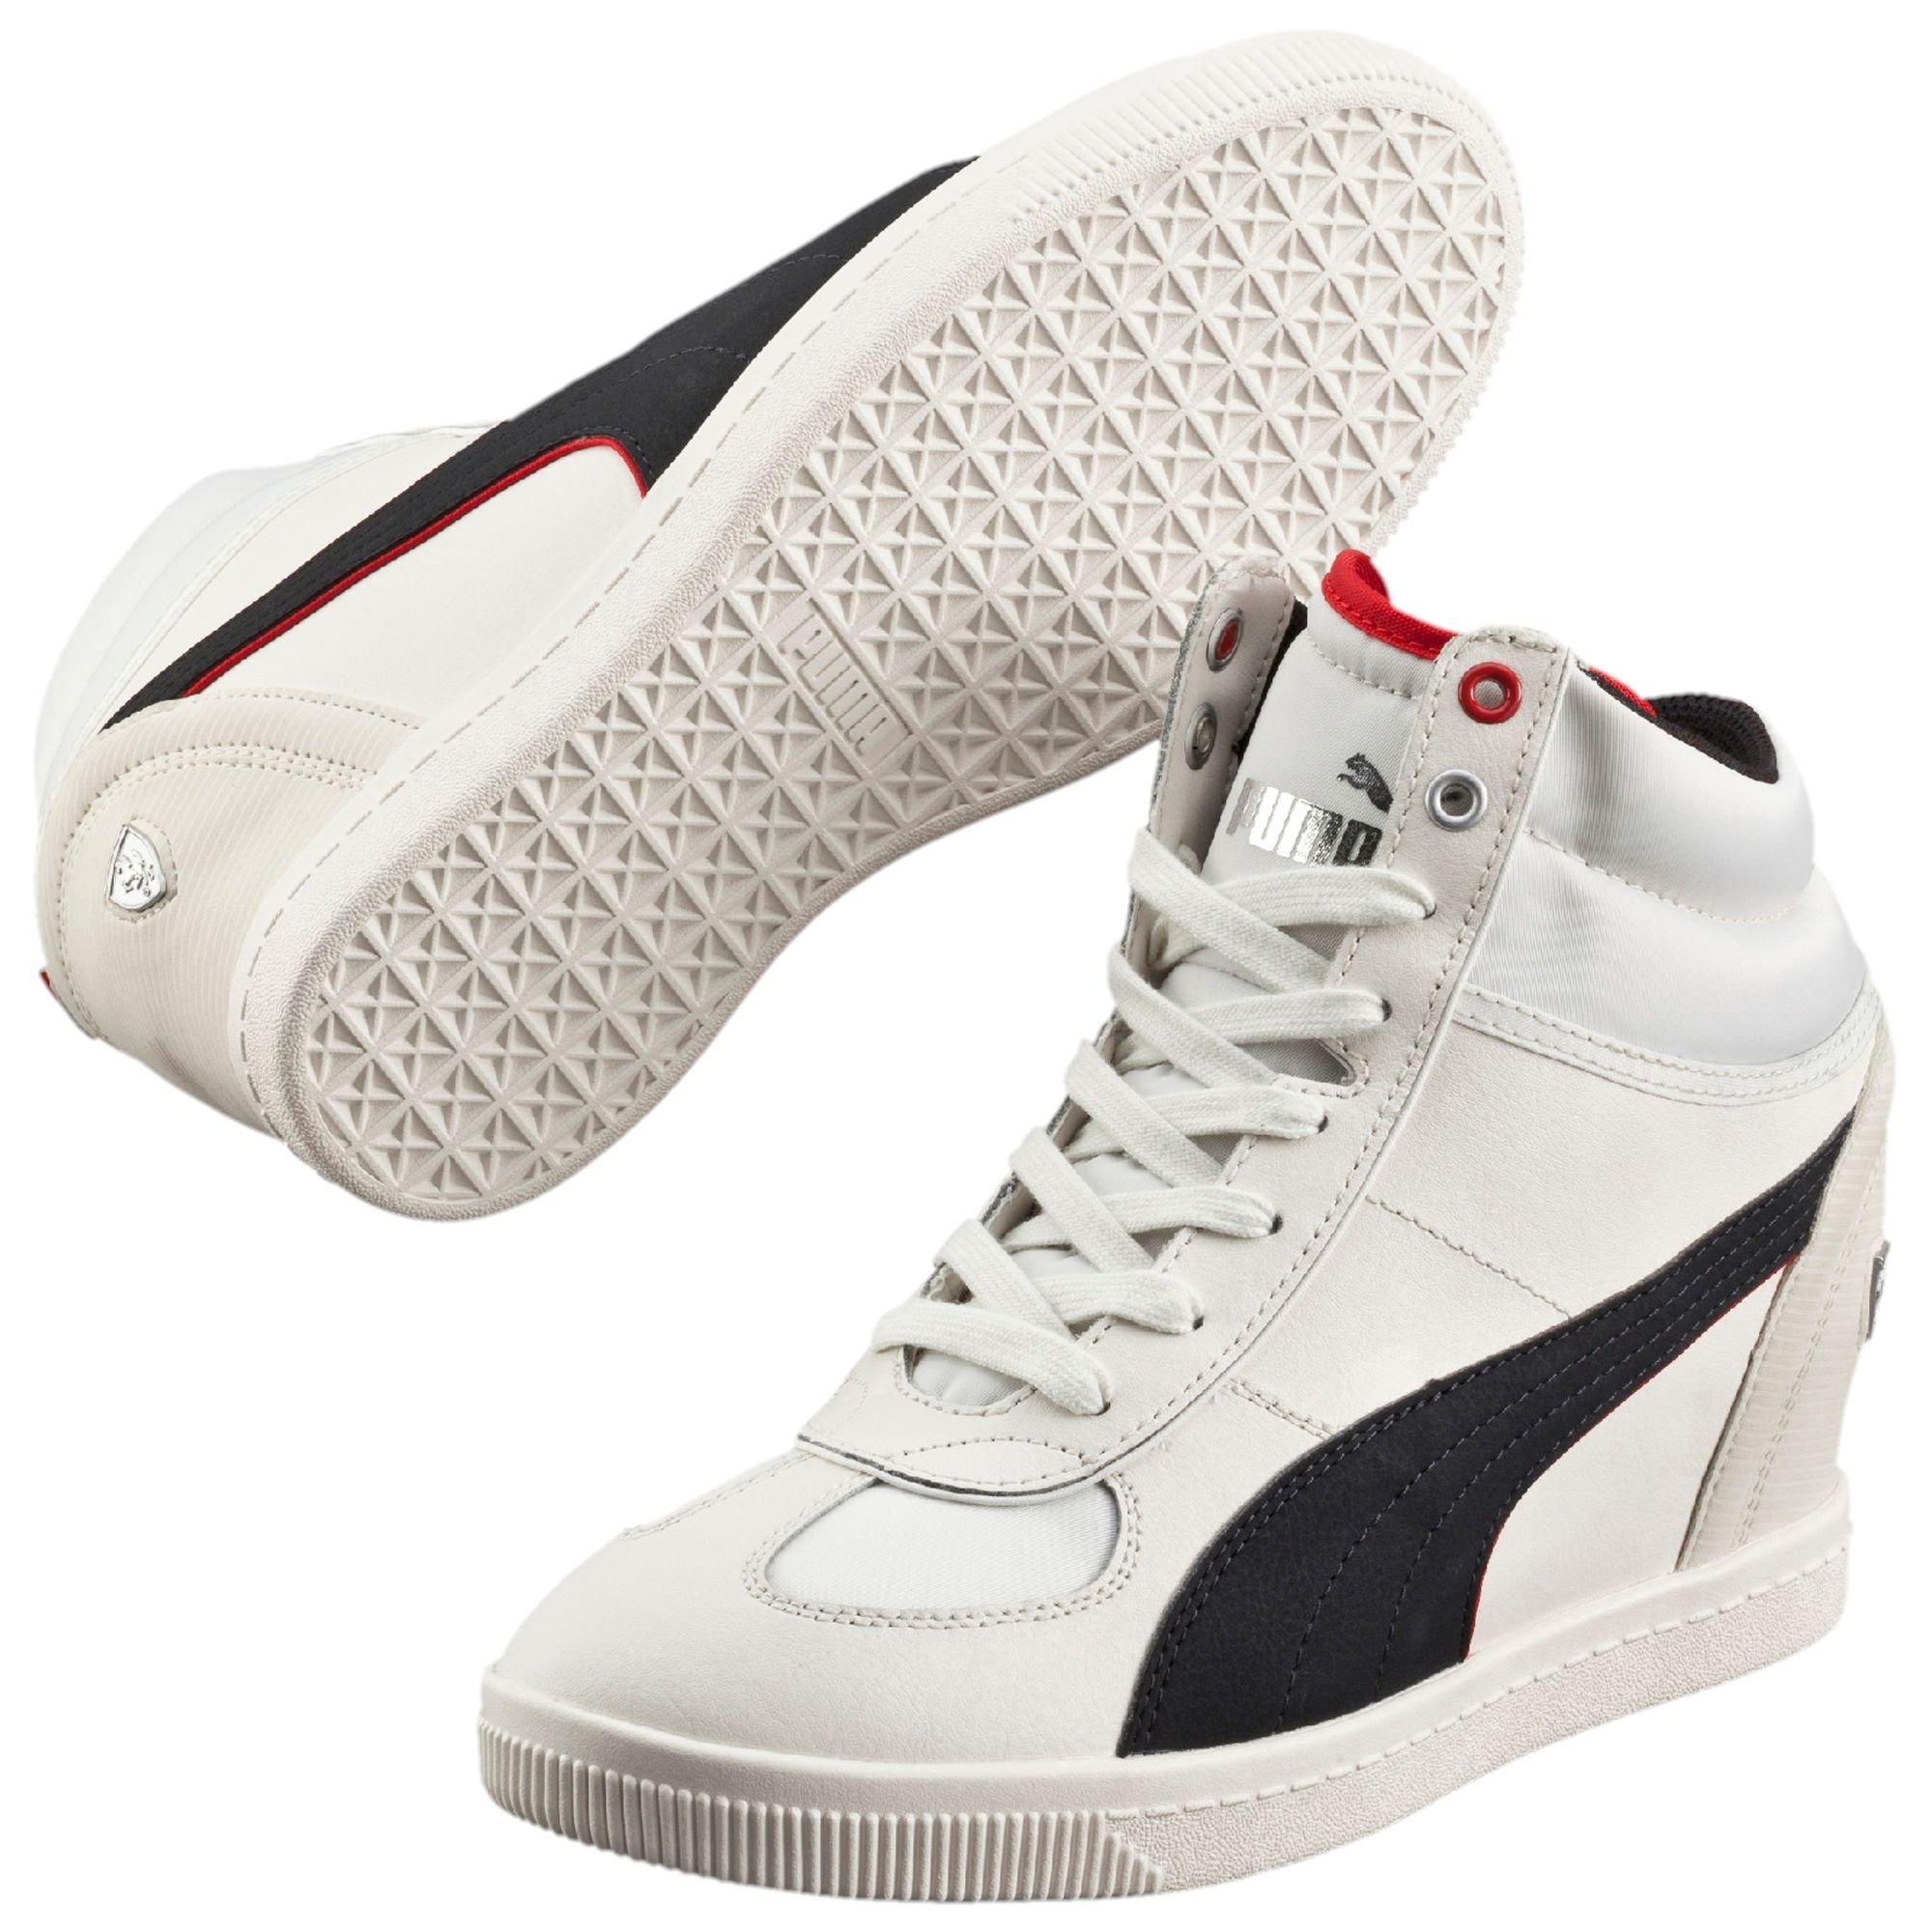 352ea69b5dbc Lyst - PUMA Ferrari Selection Nm Women s Wedge Sneakers in White